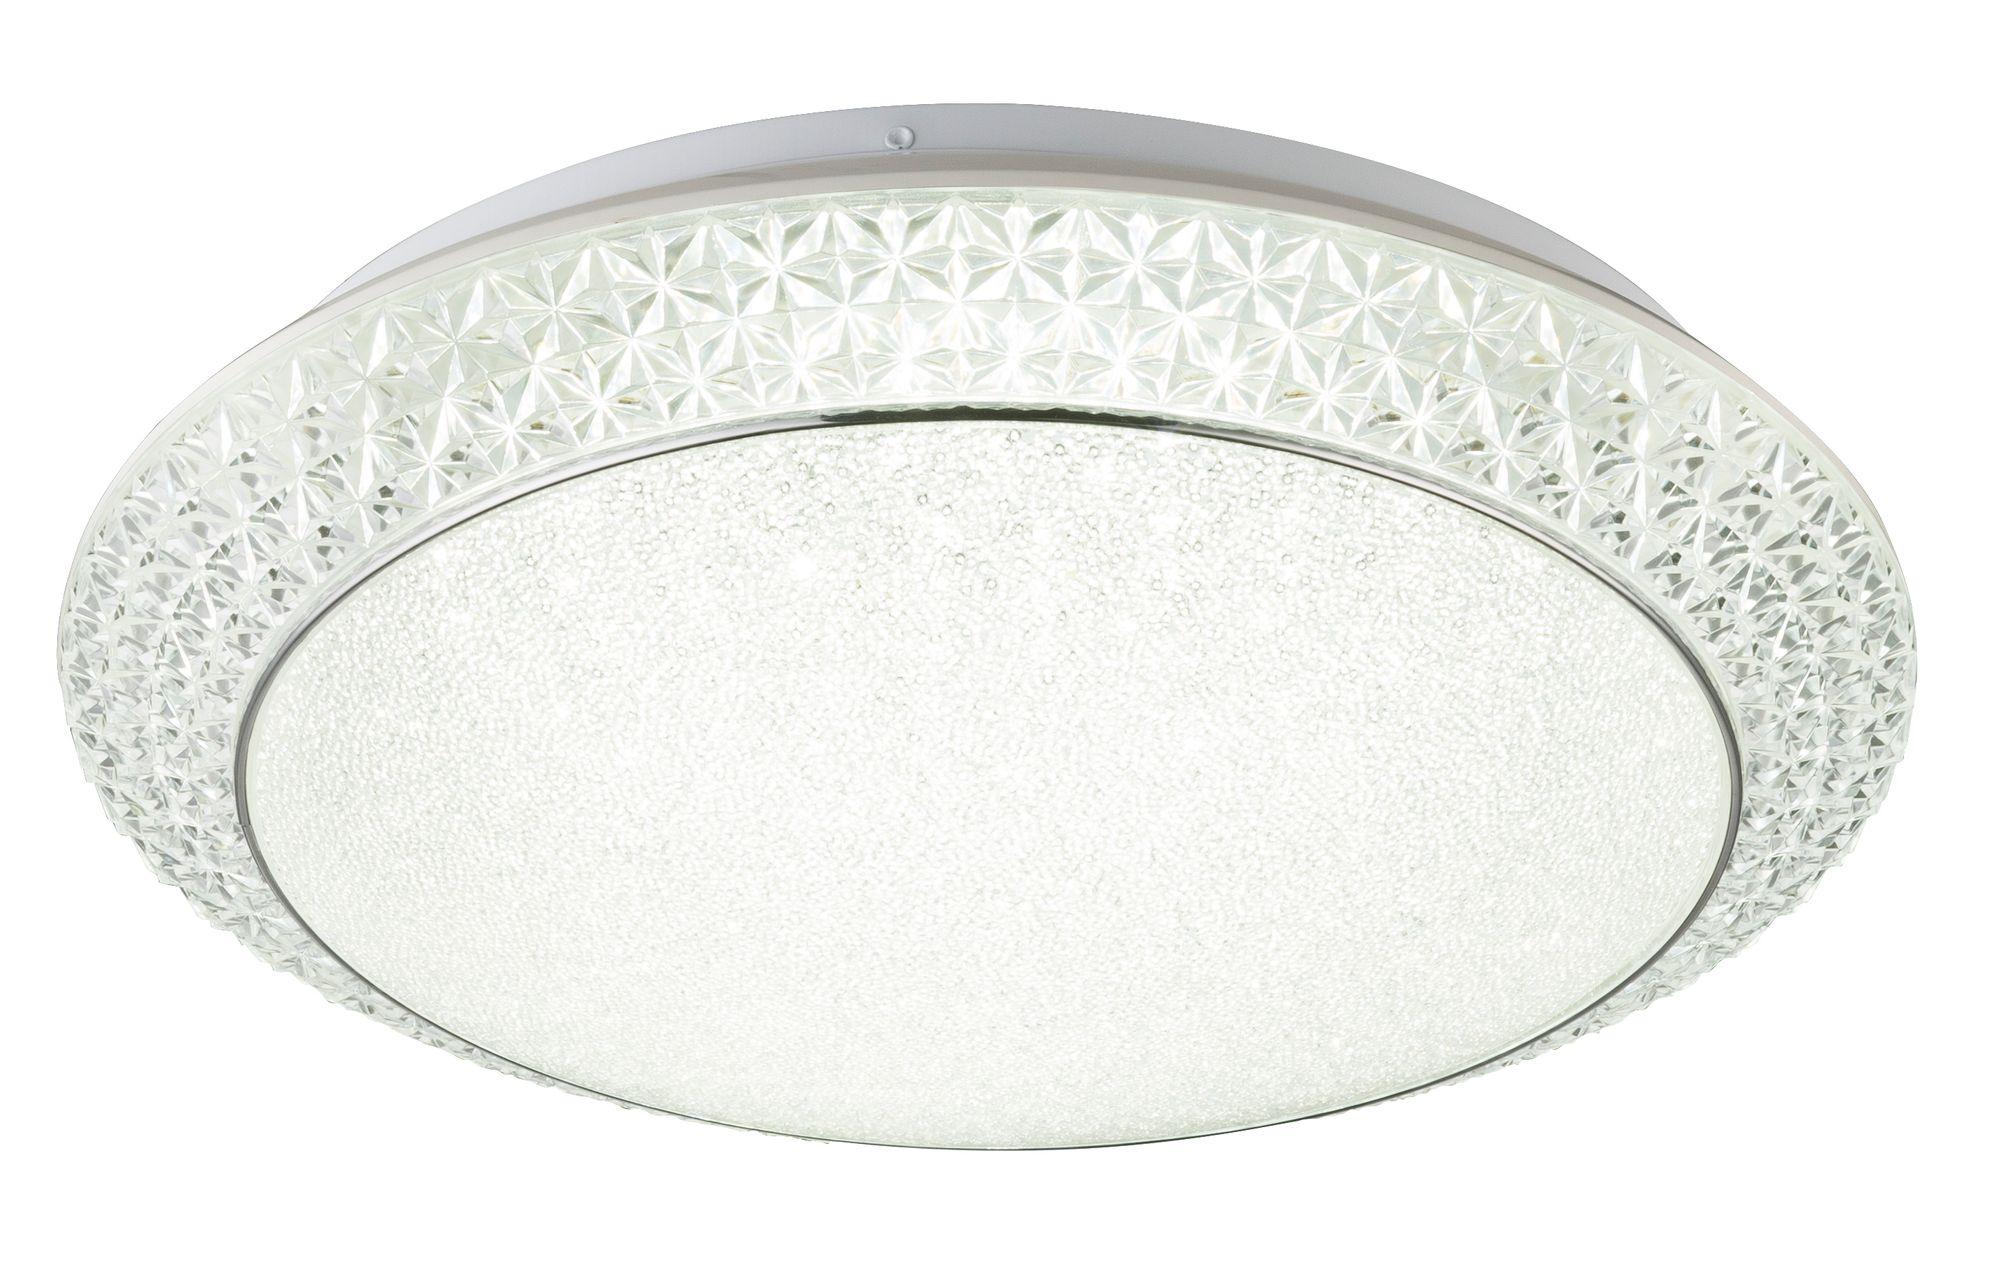 deckenlampe metall weiss acryl satiniert kunststoffkristalle klar dimmbar fernbedienung. Black Bedroom Furniture Sets. Home Design Ideas